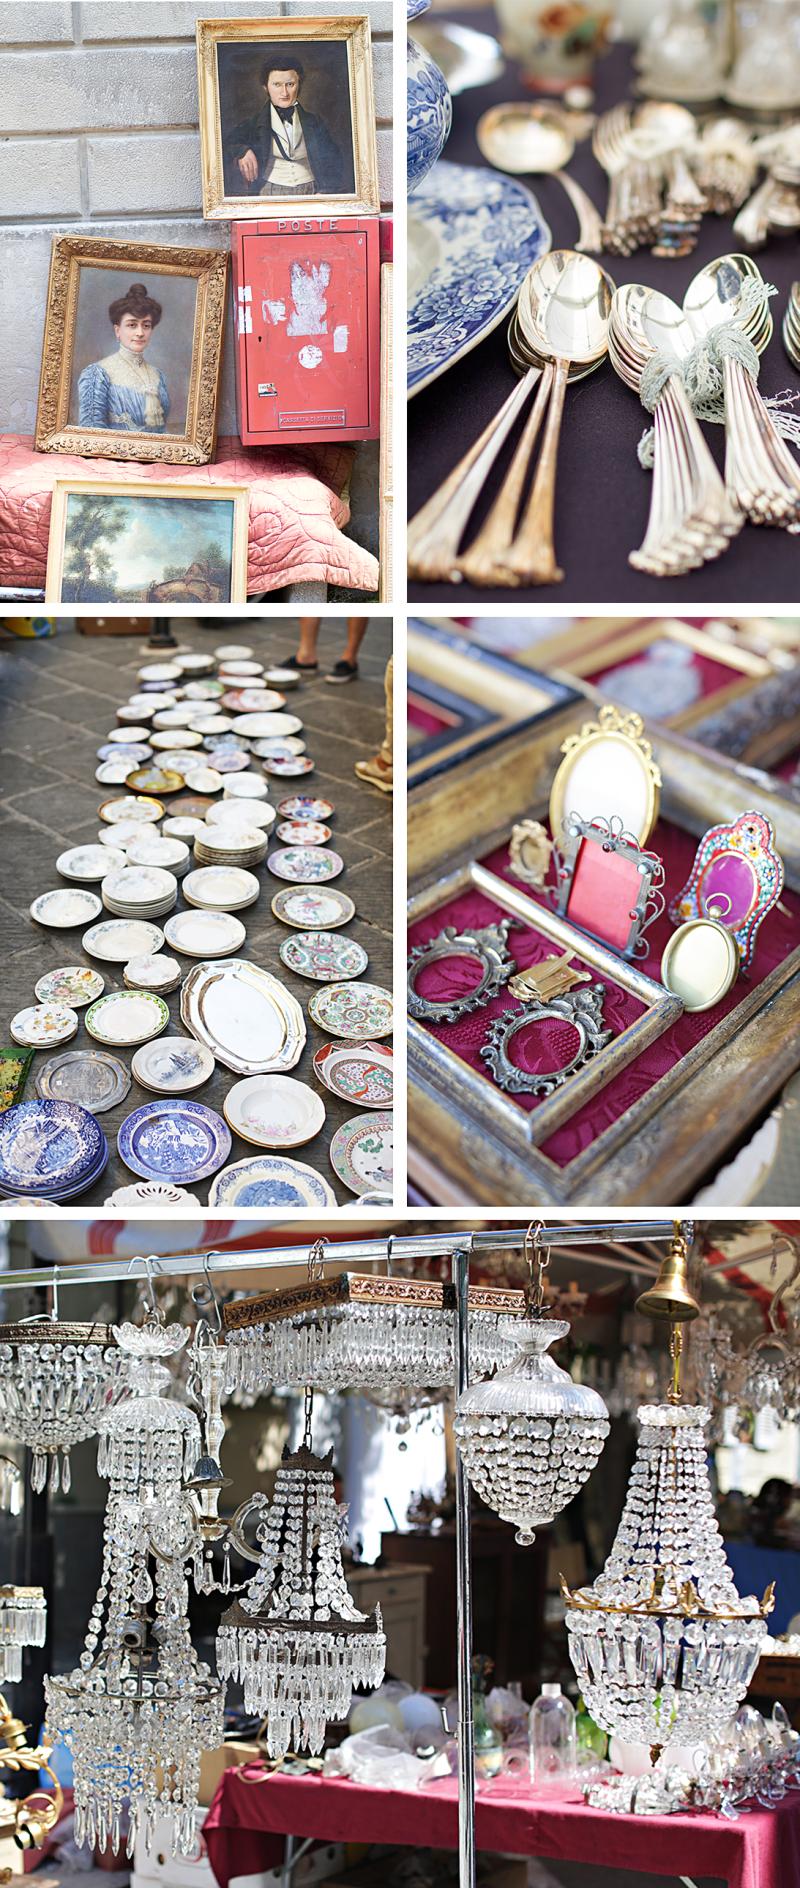 Antique market image collage